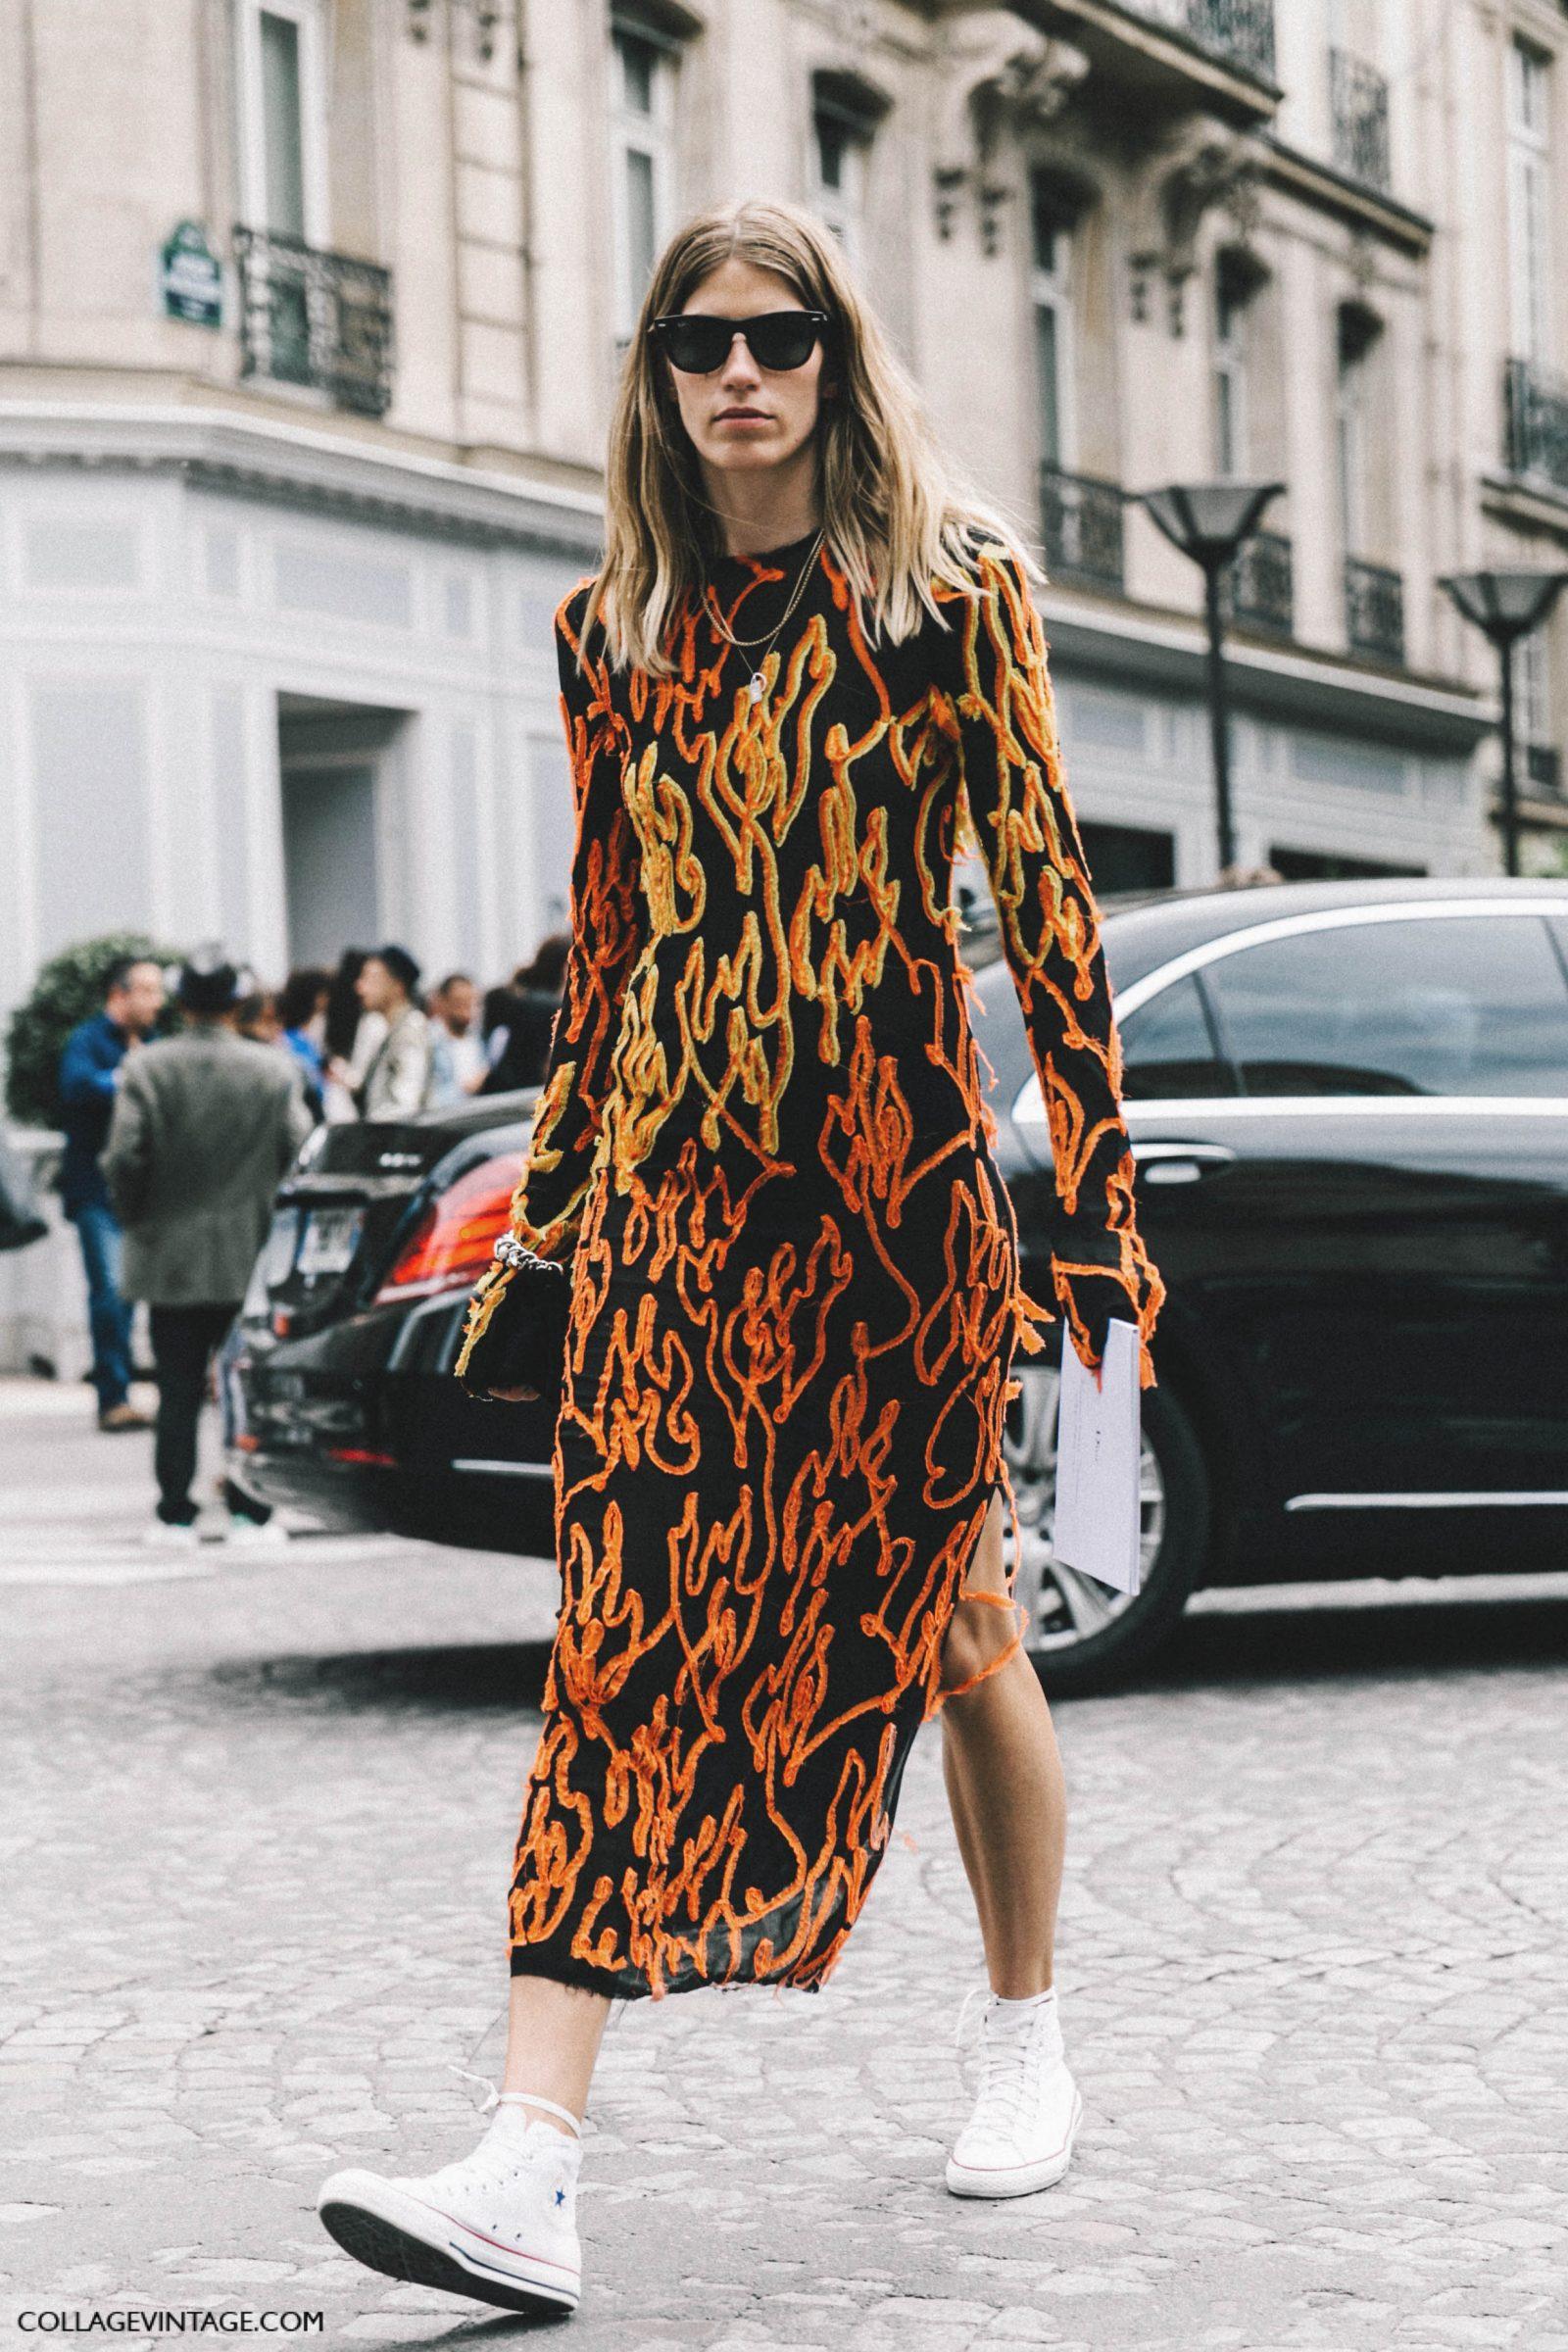 Paris_Couture_Fashion_Week-Collage_Vintage-Street_Style-103